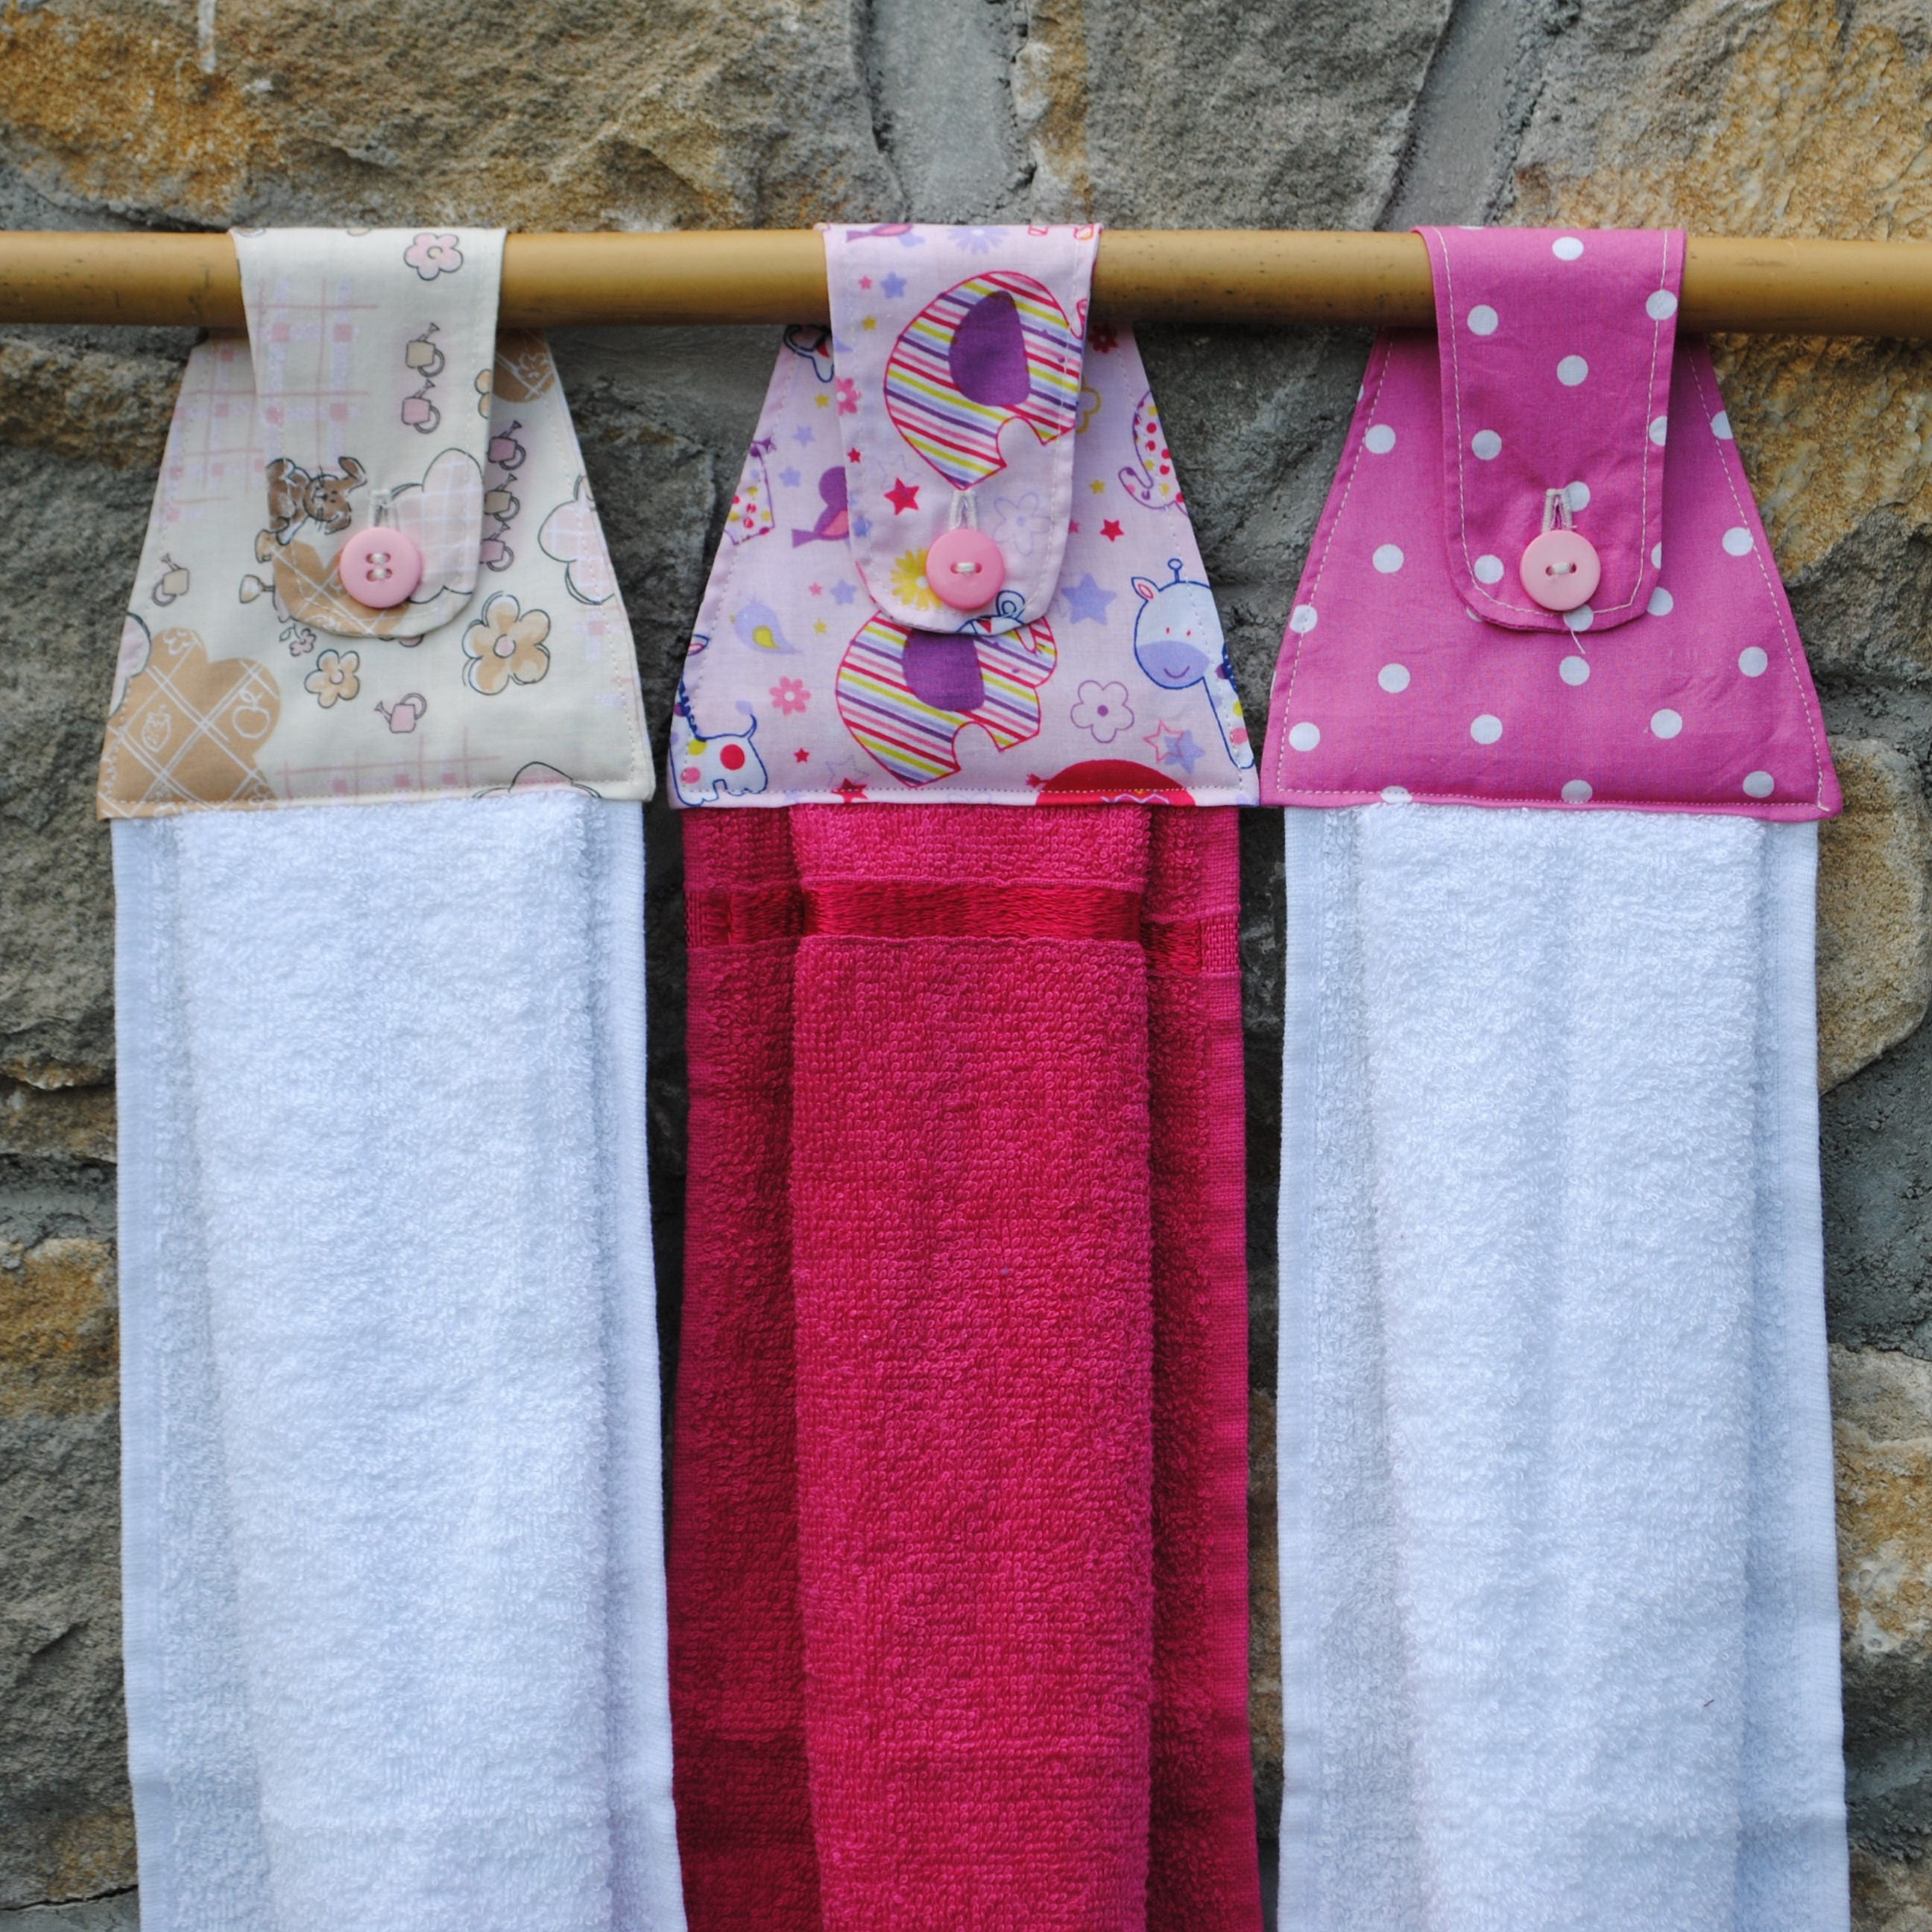 Red Kitchen Hand Towels: Hanging Towels: Custom Made Hand Towel Tea Towel Kitchen